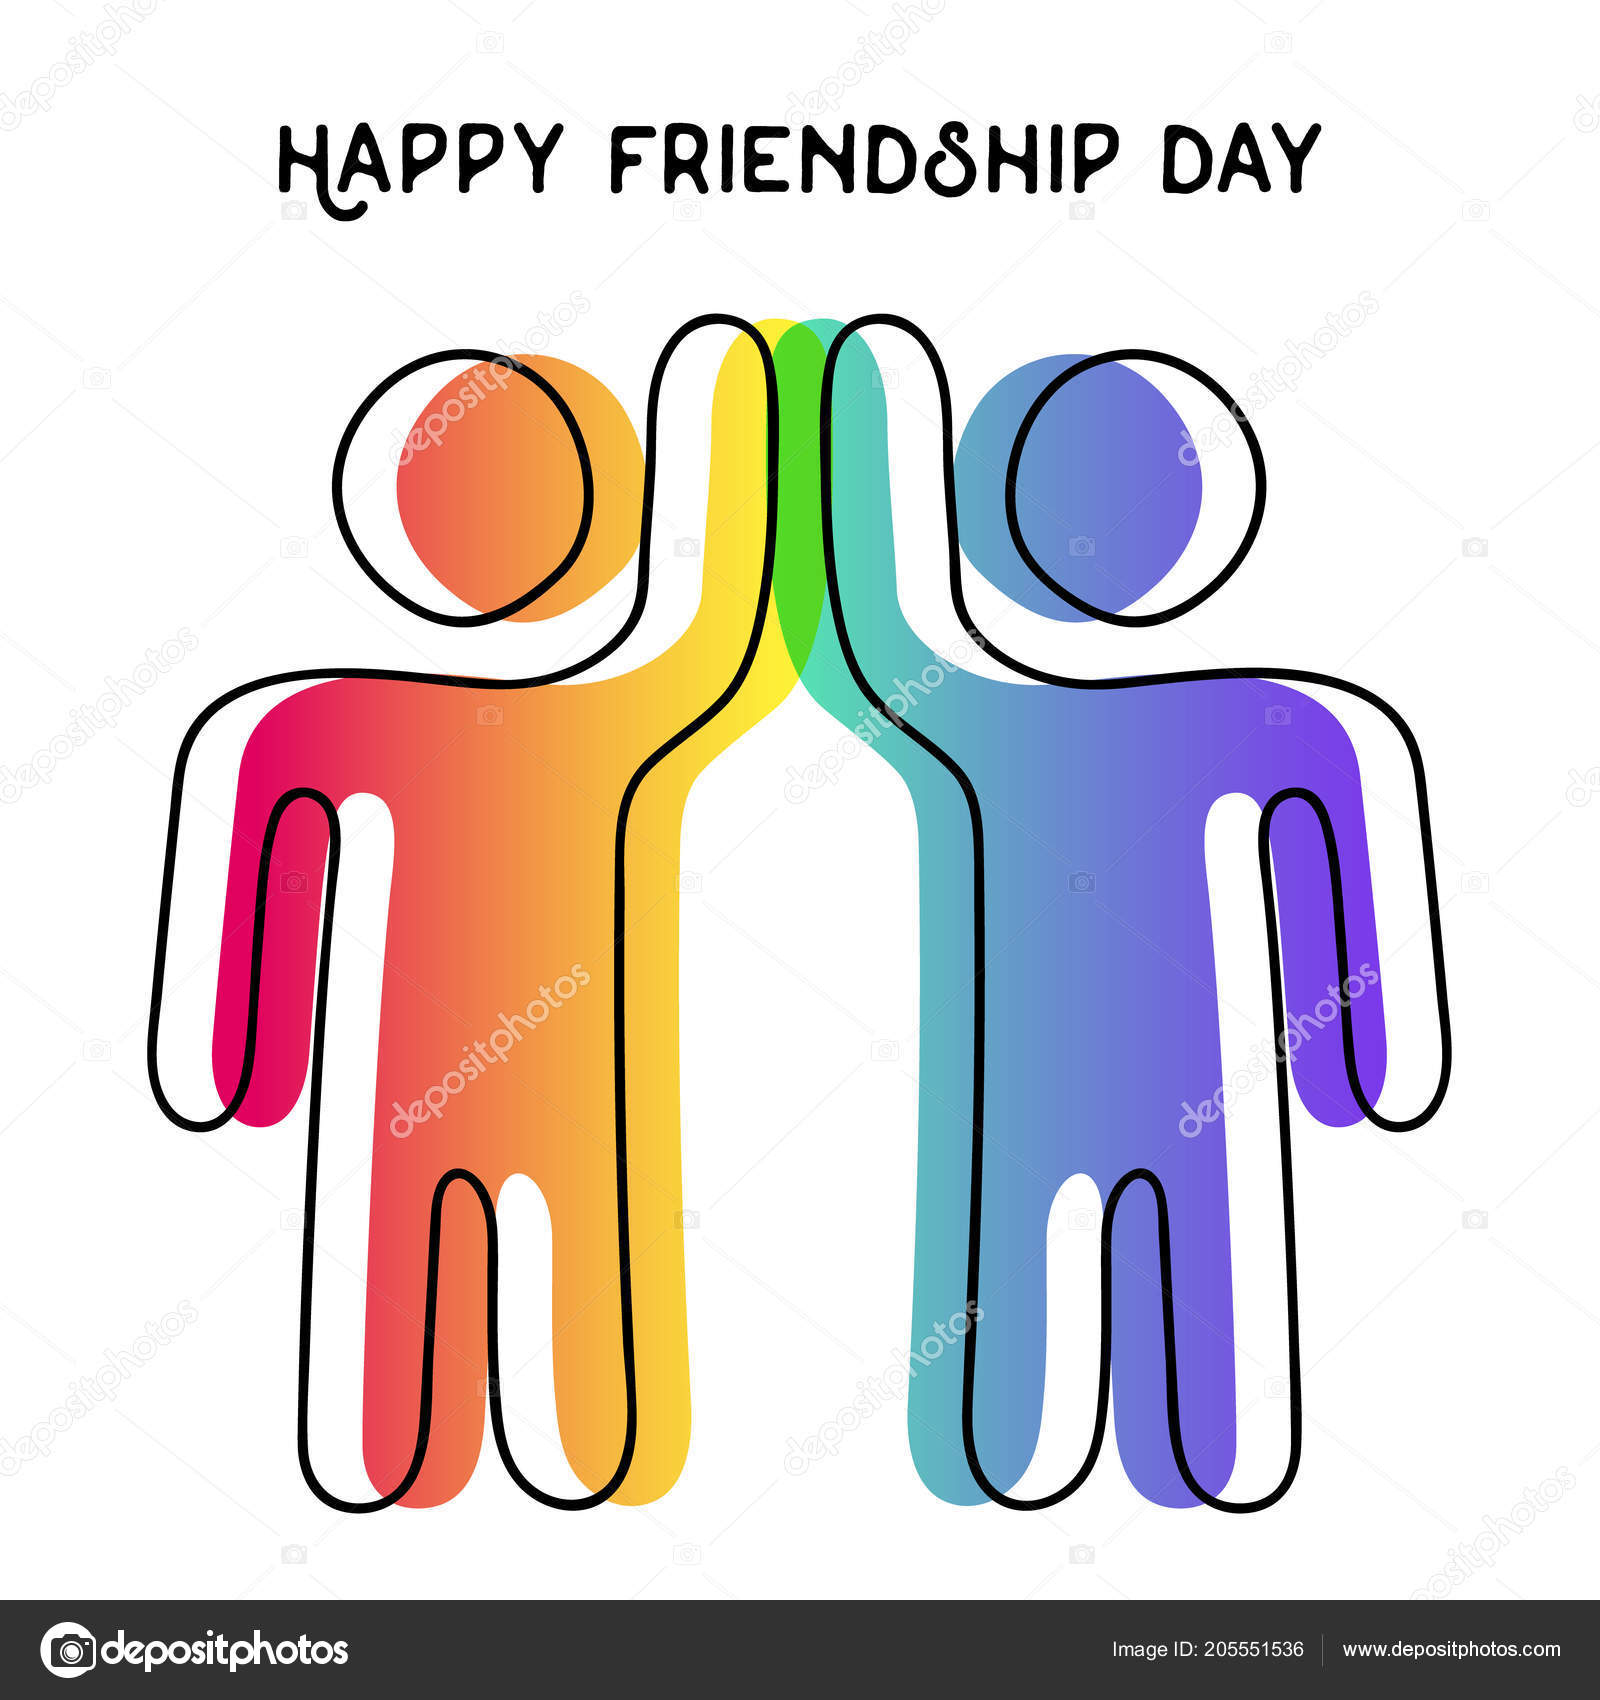 Happy friendship day greeting card friends doing high five special happy friendship day greeting card friends doing high five special stock vector m4hsunfo